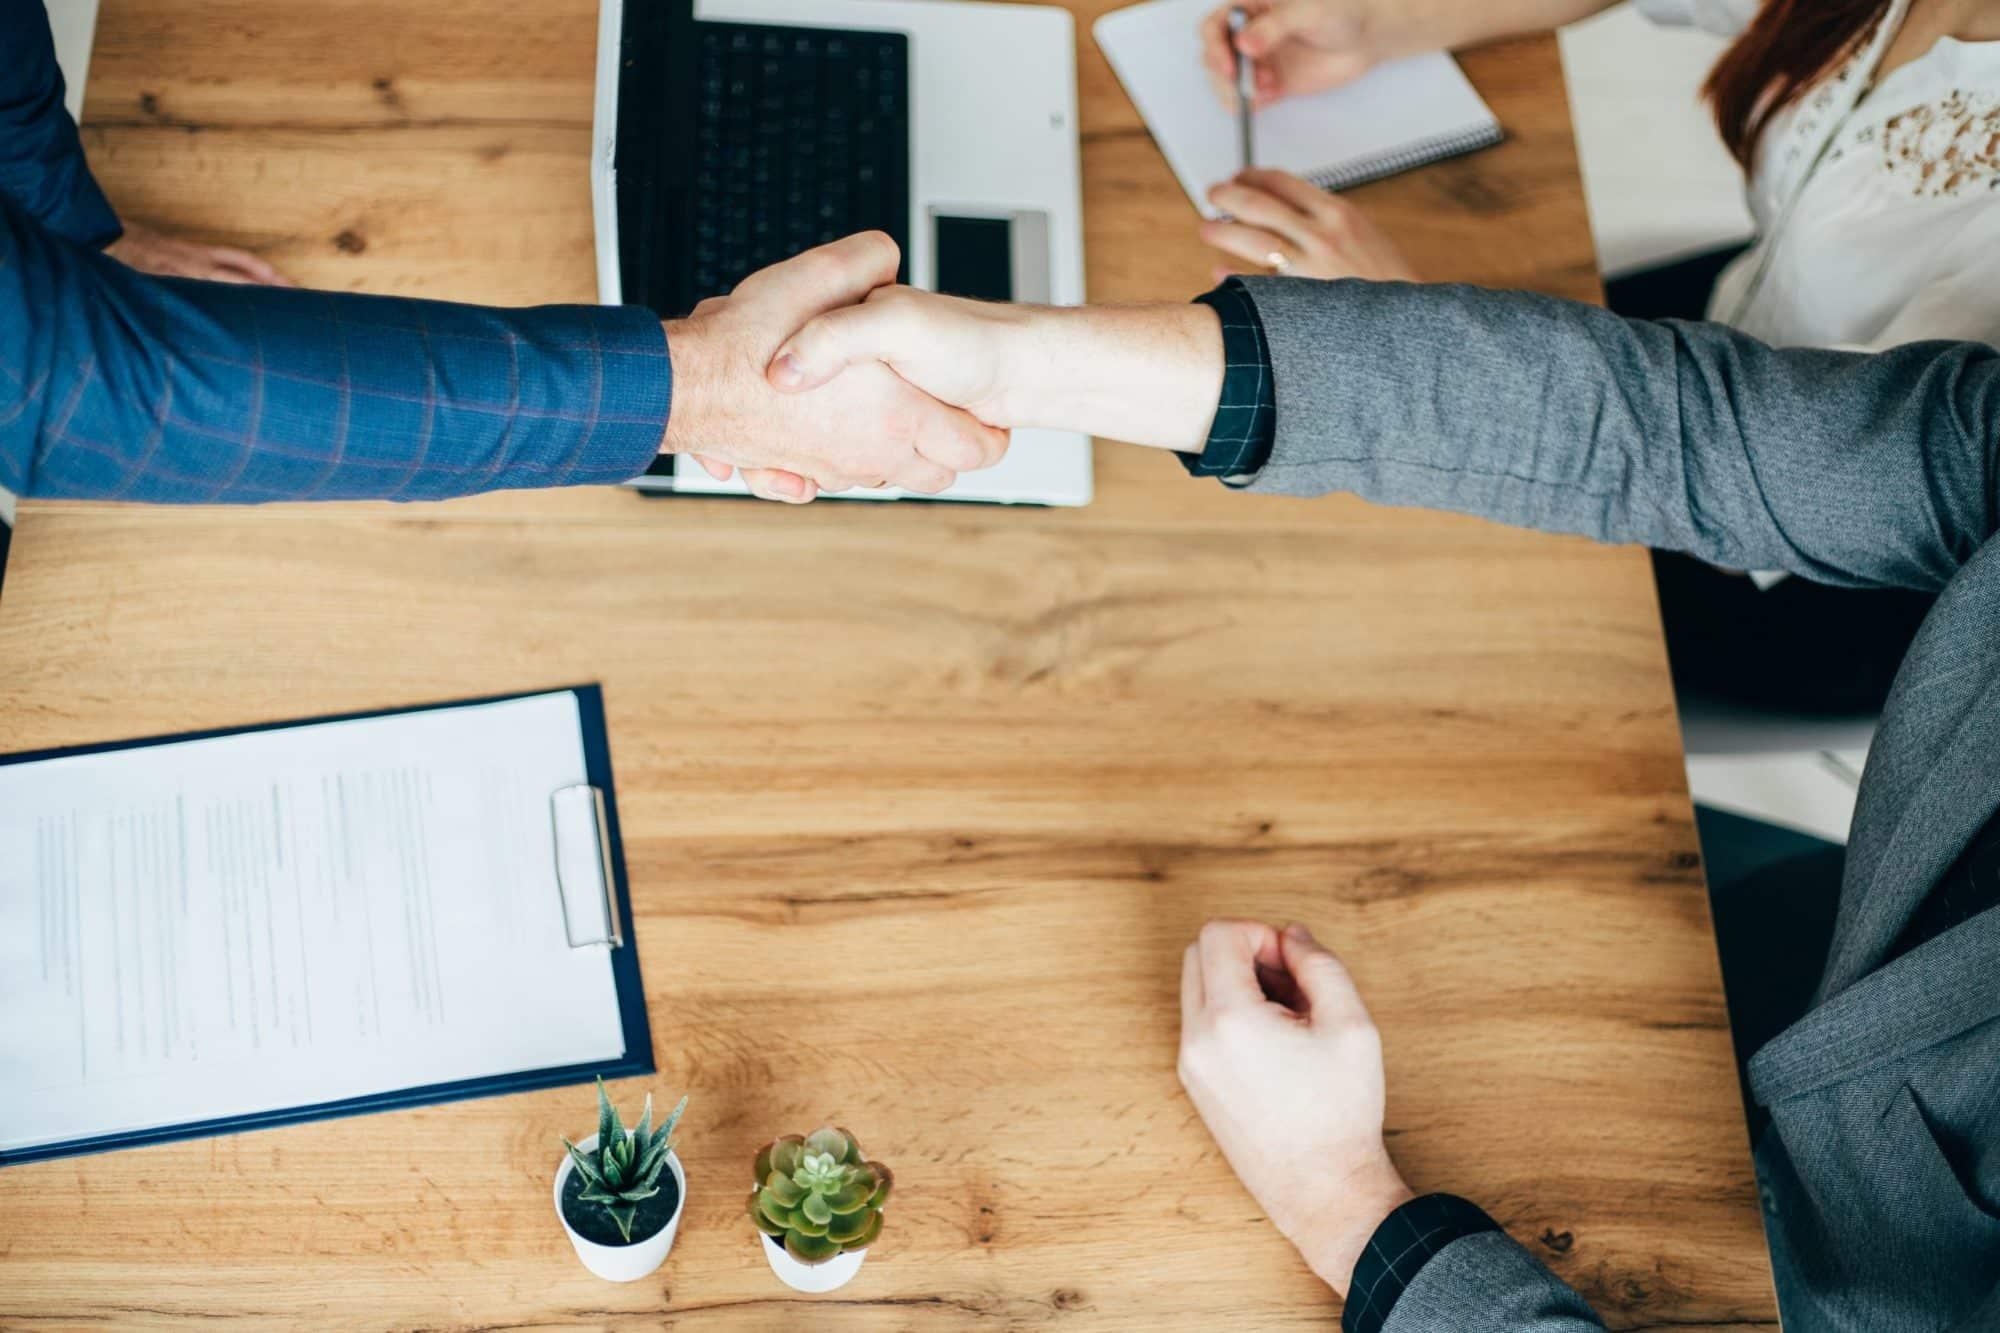 Business partners handshaking after deal